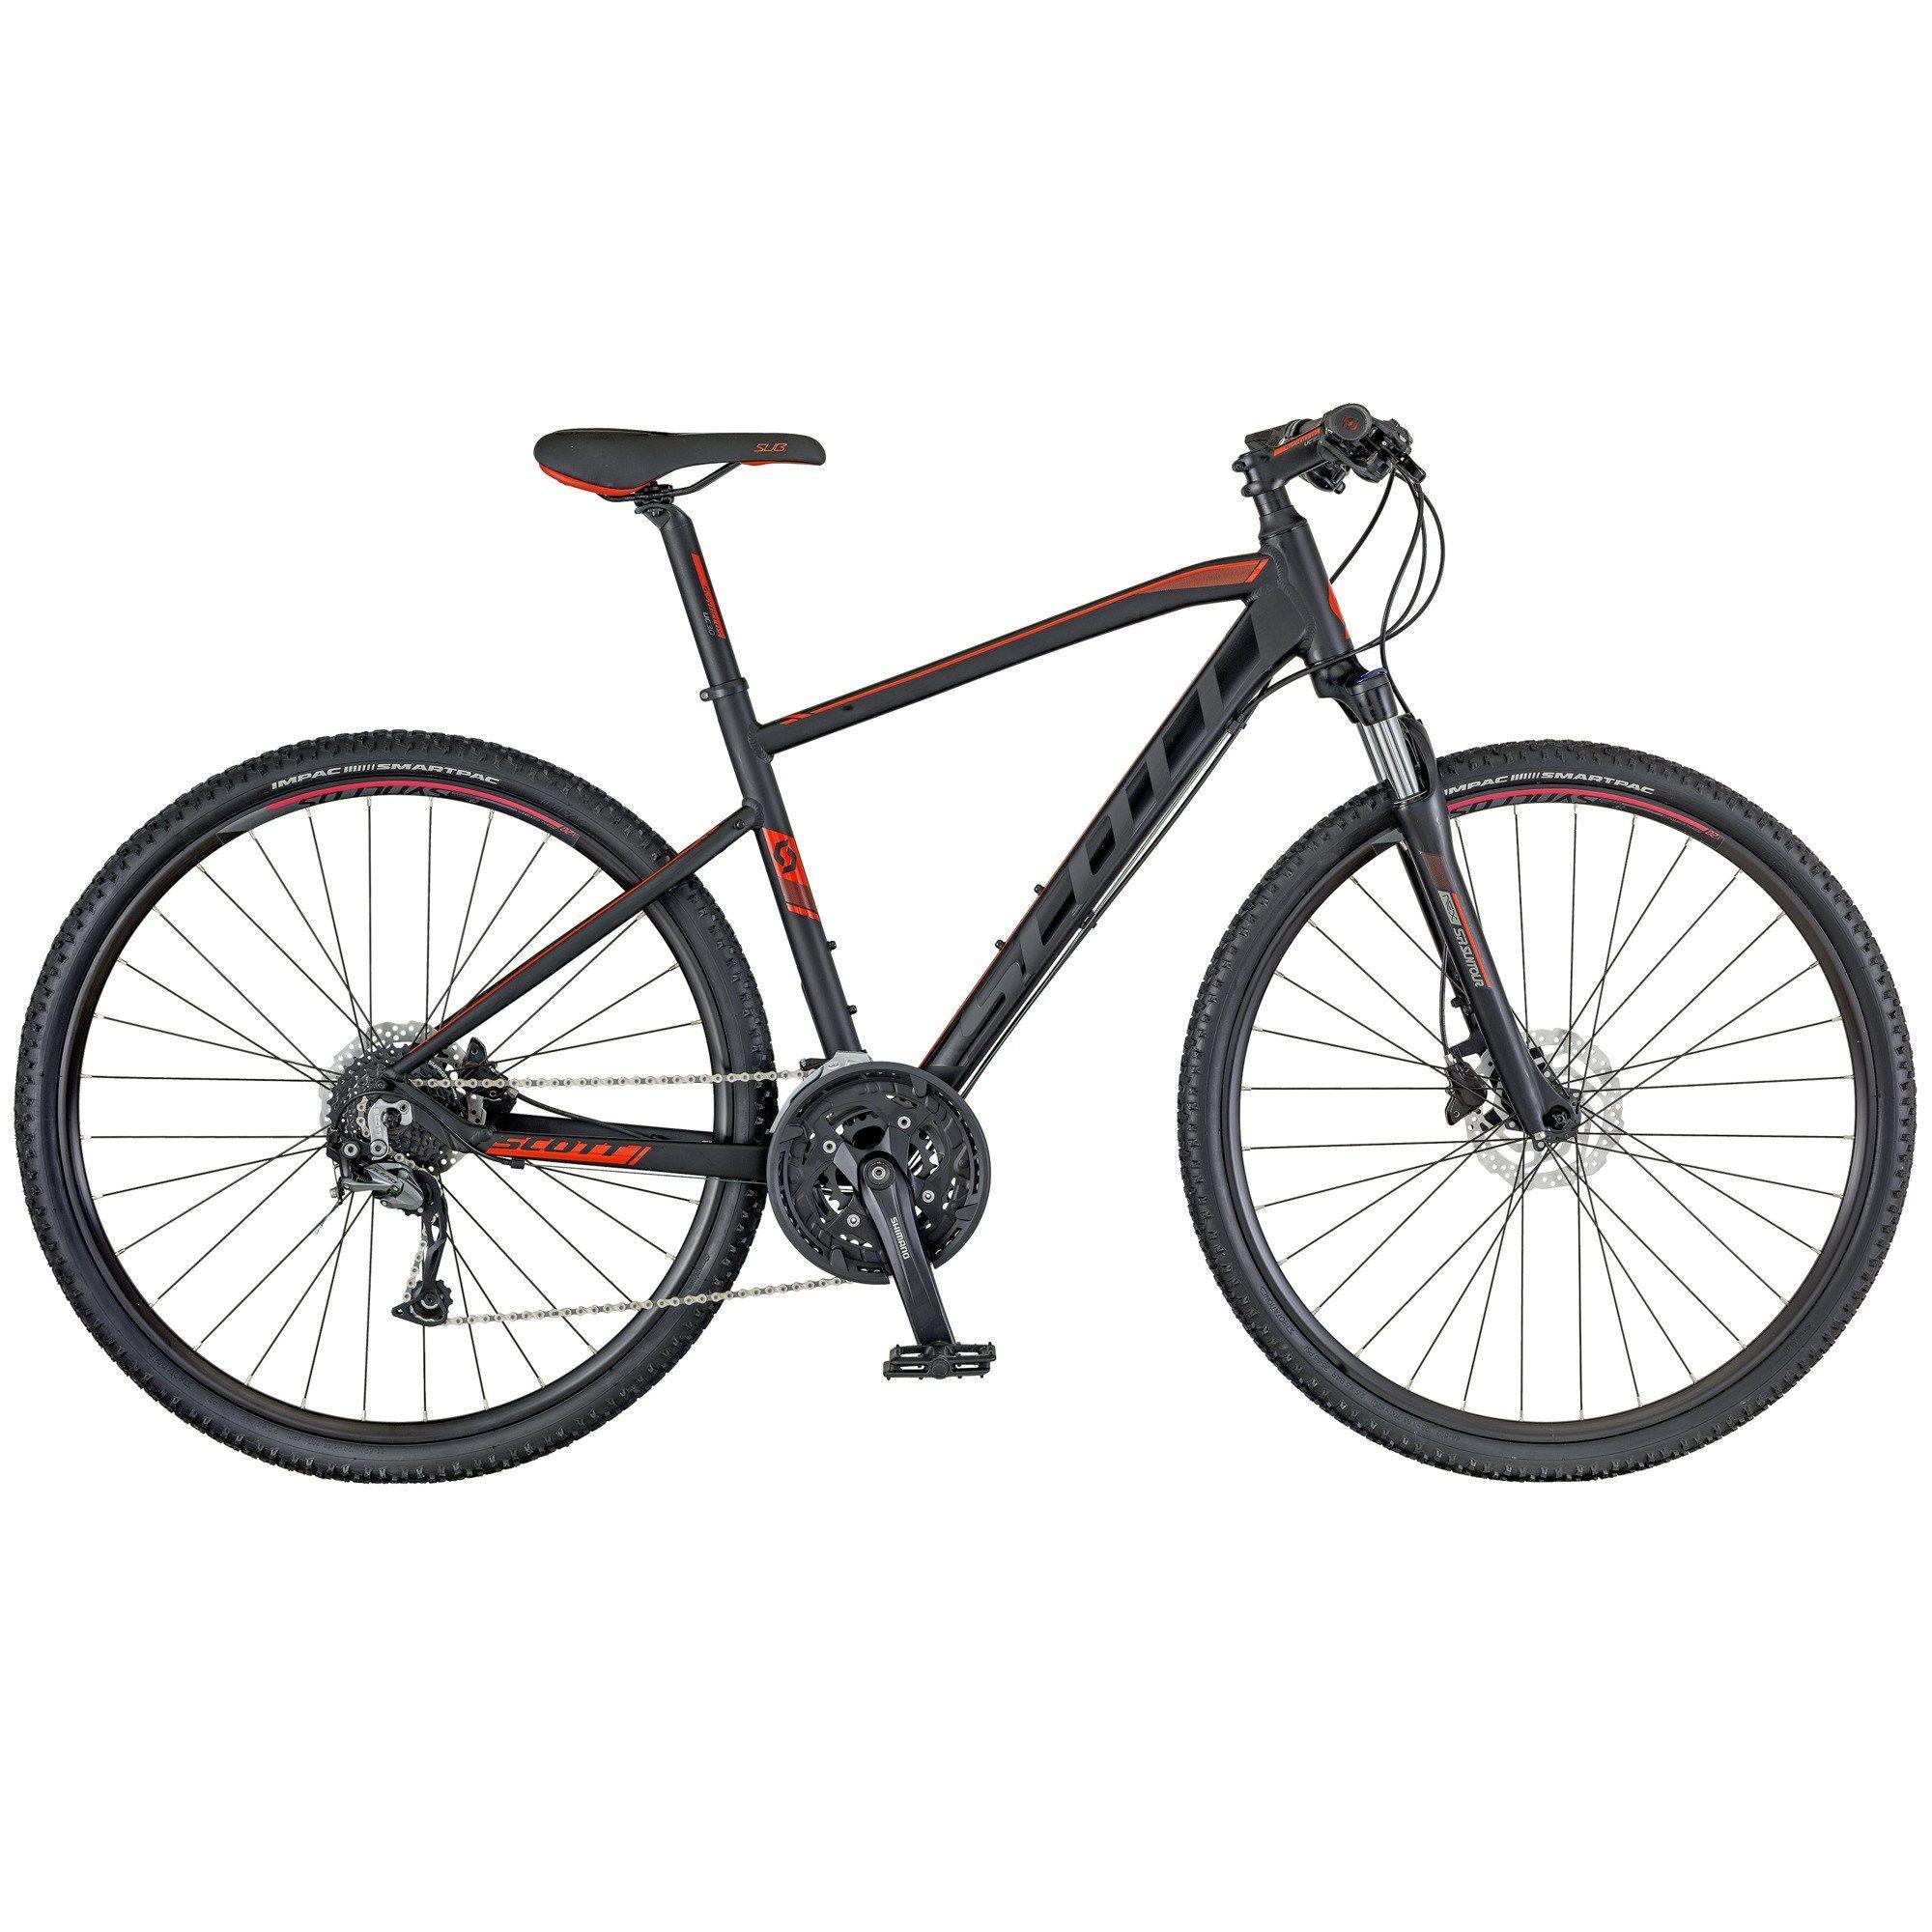 Scott Subcross 30 Men Black Red Urban City Bikes Cbi Bikes